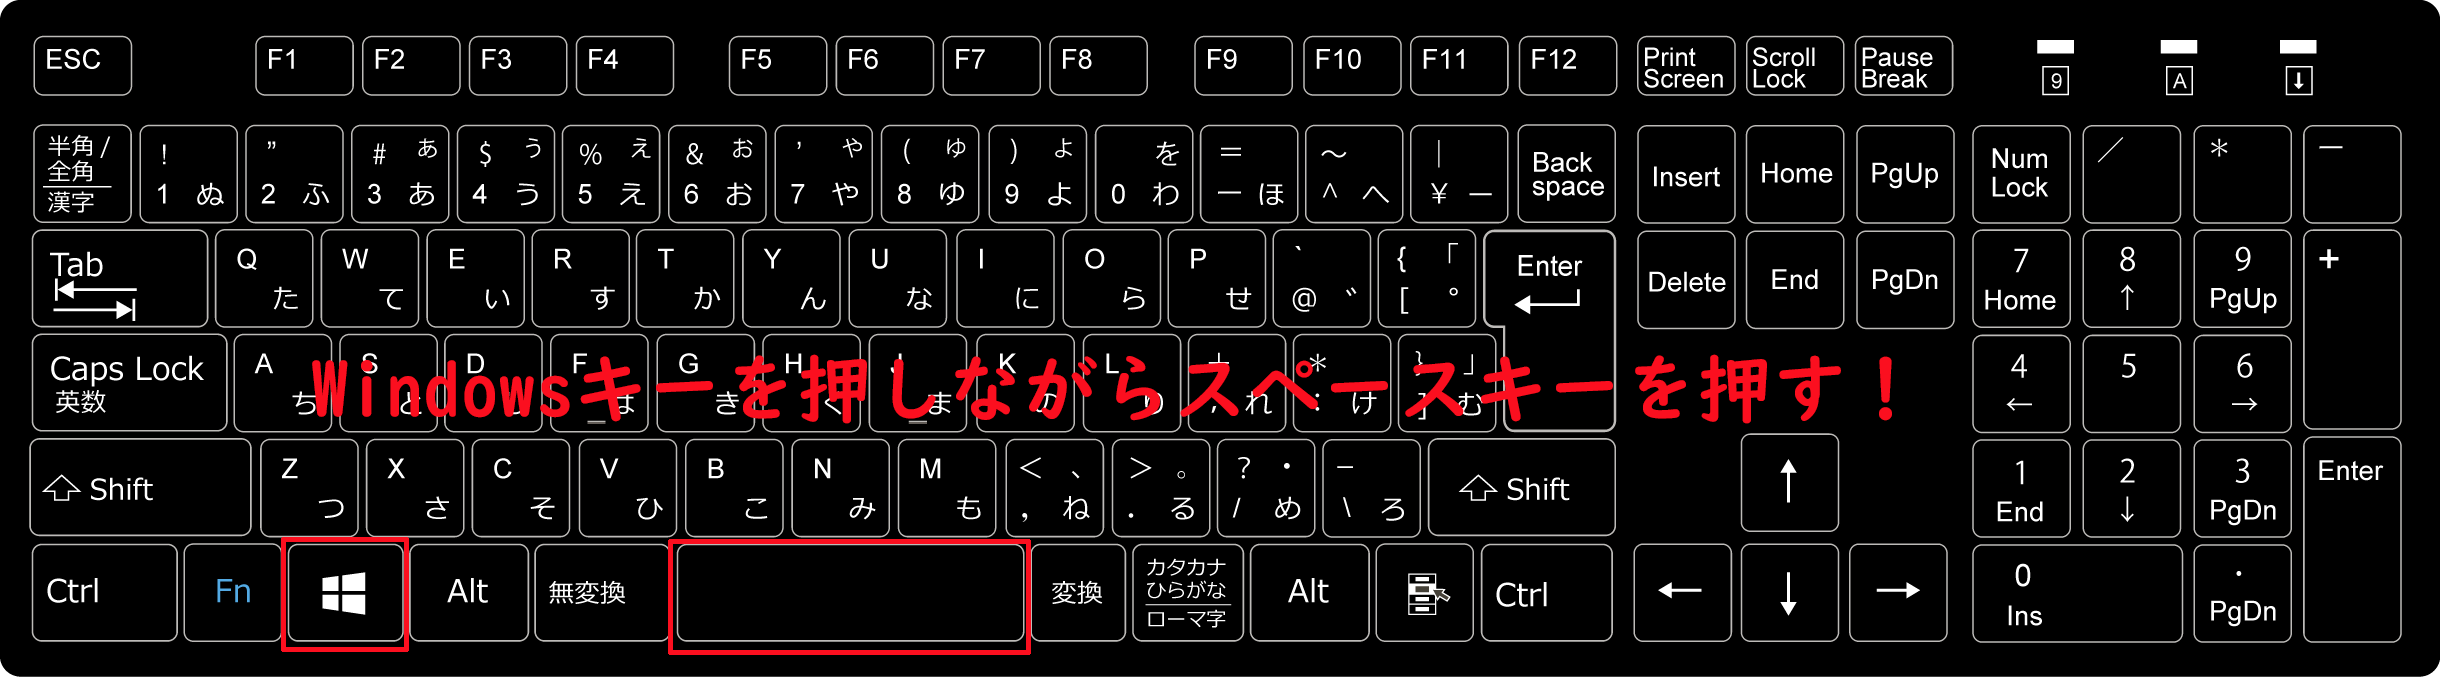 Windowsキーを押しながらスペースキーを押す!